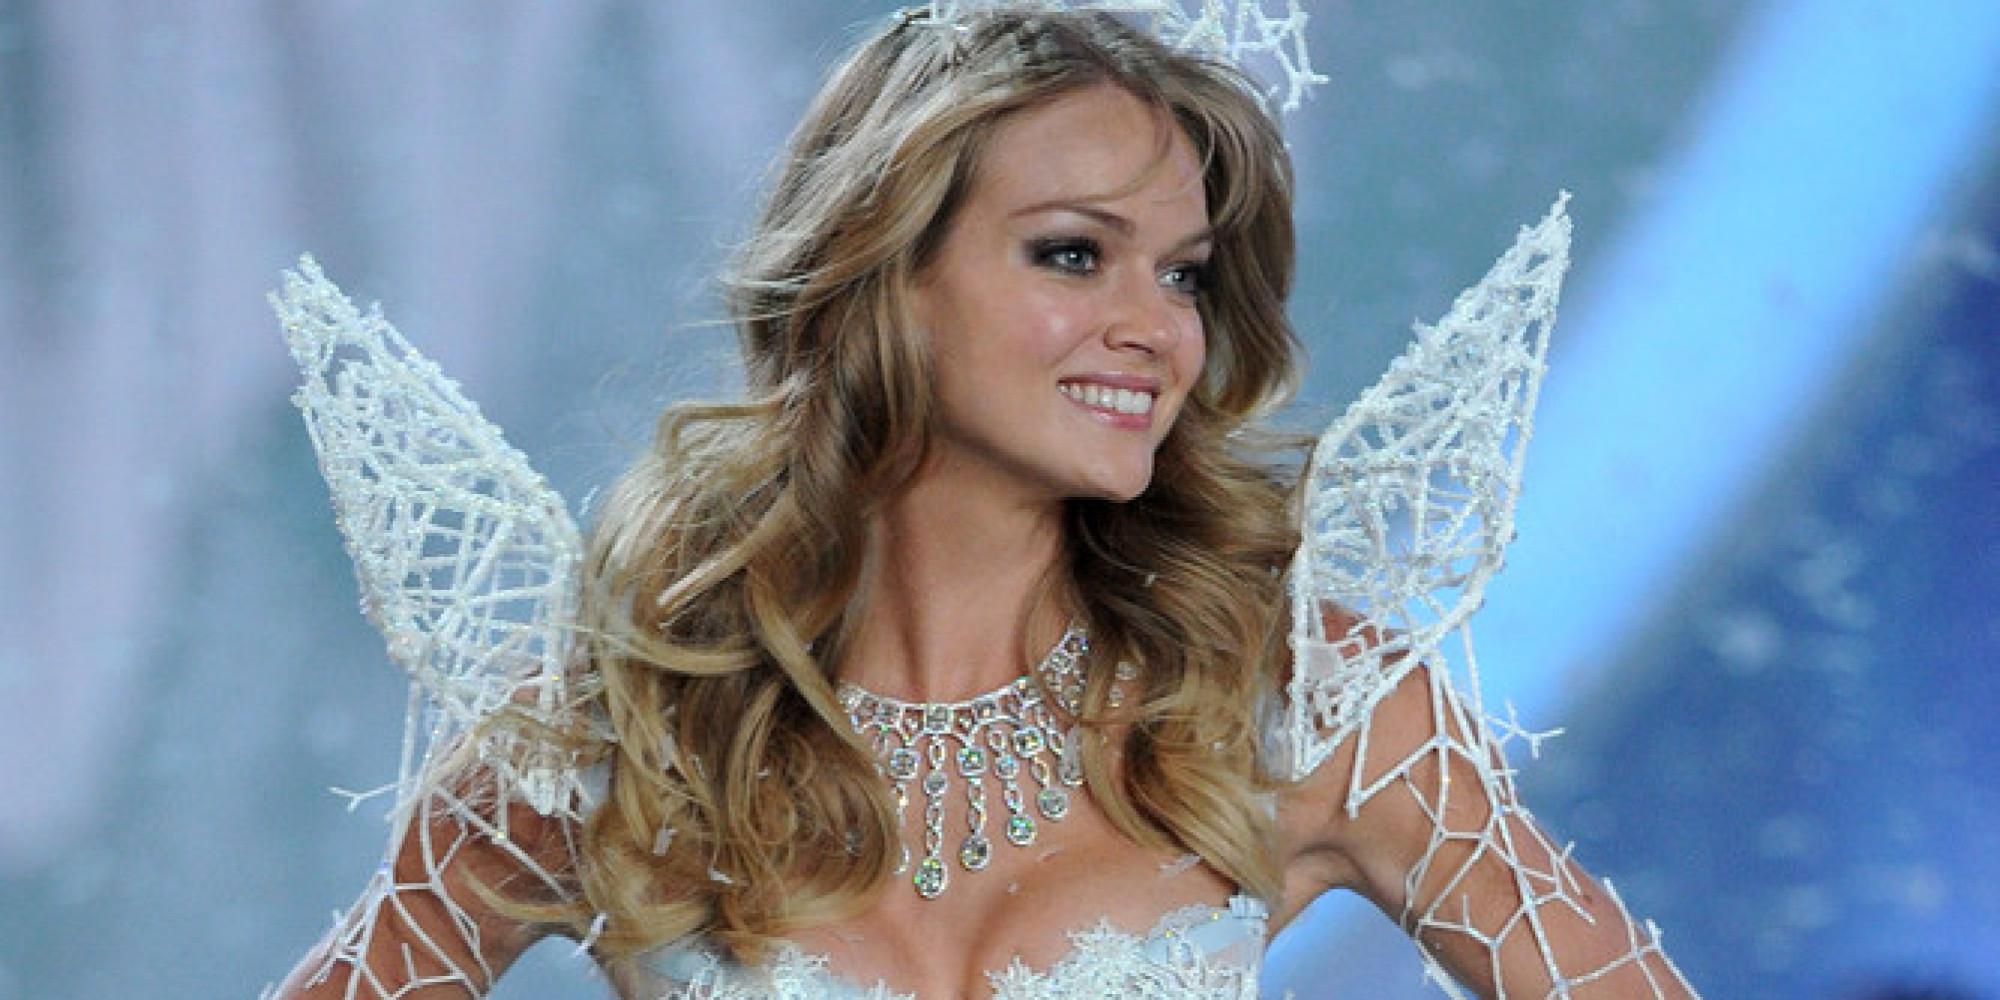 Victorias Secret Angel Wings Wallpaper Victoria's Secret Crea...